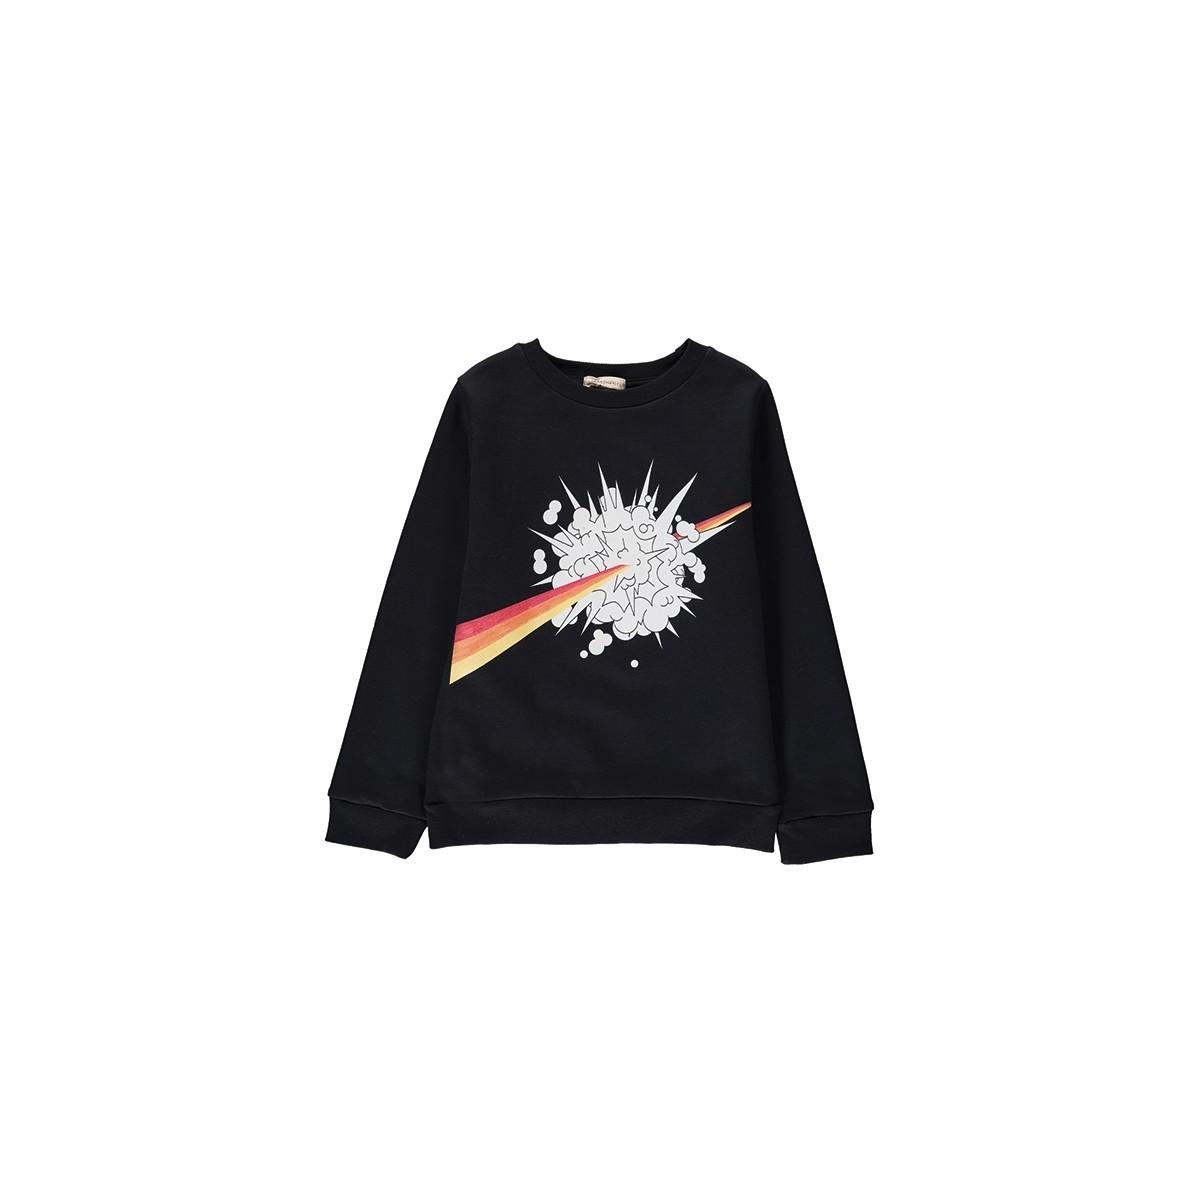 Sweatshirt Explosion